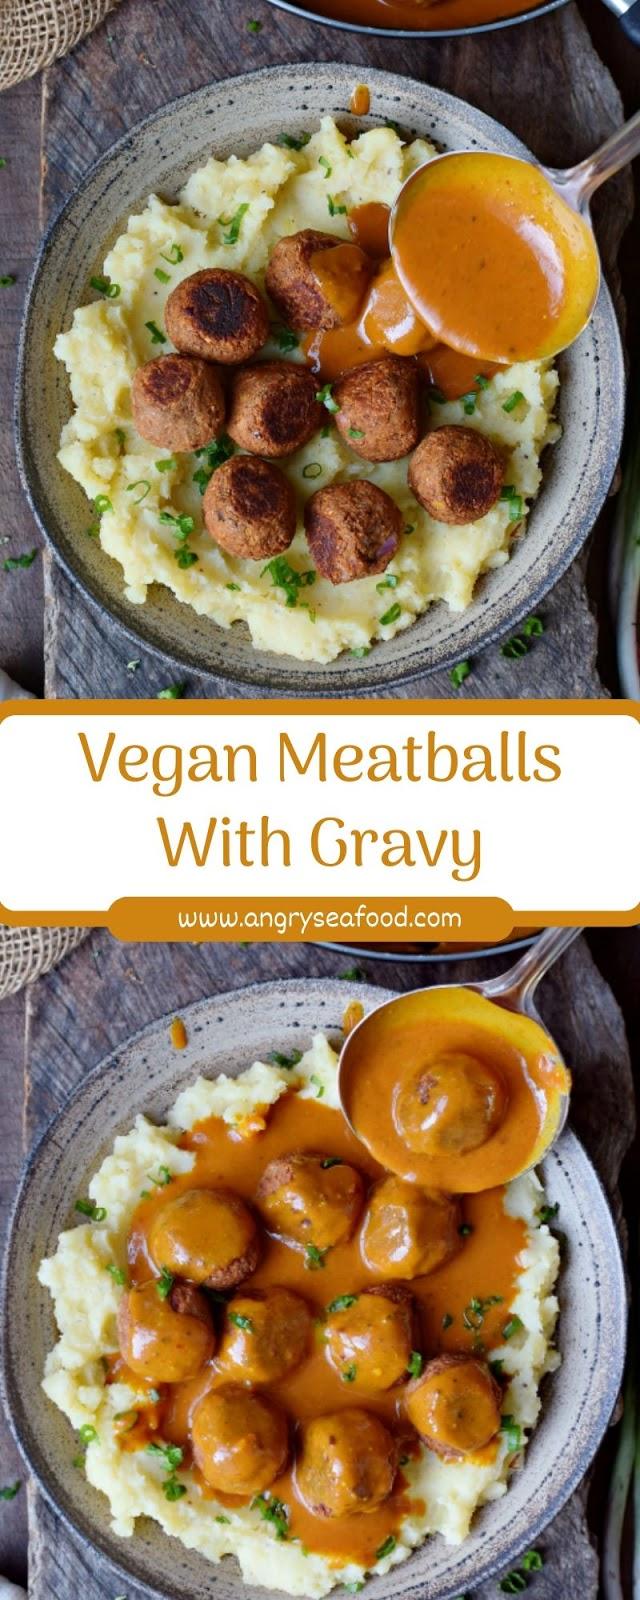 Vegan Meatballs With Gravy